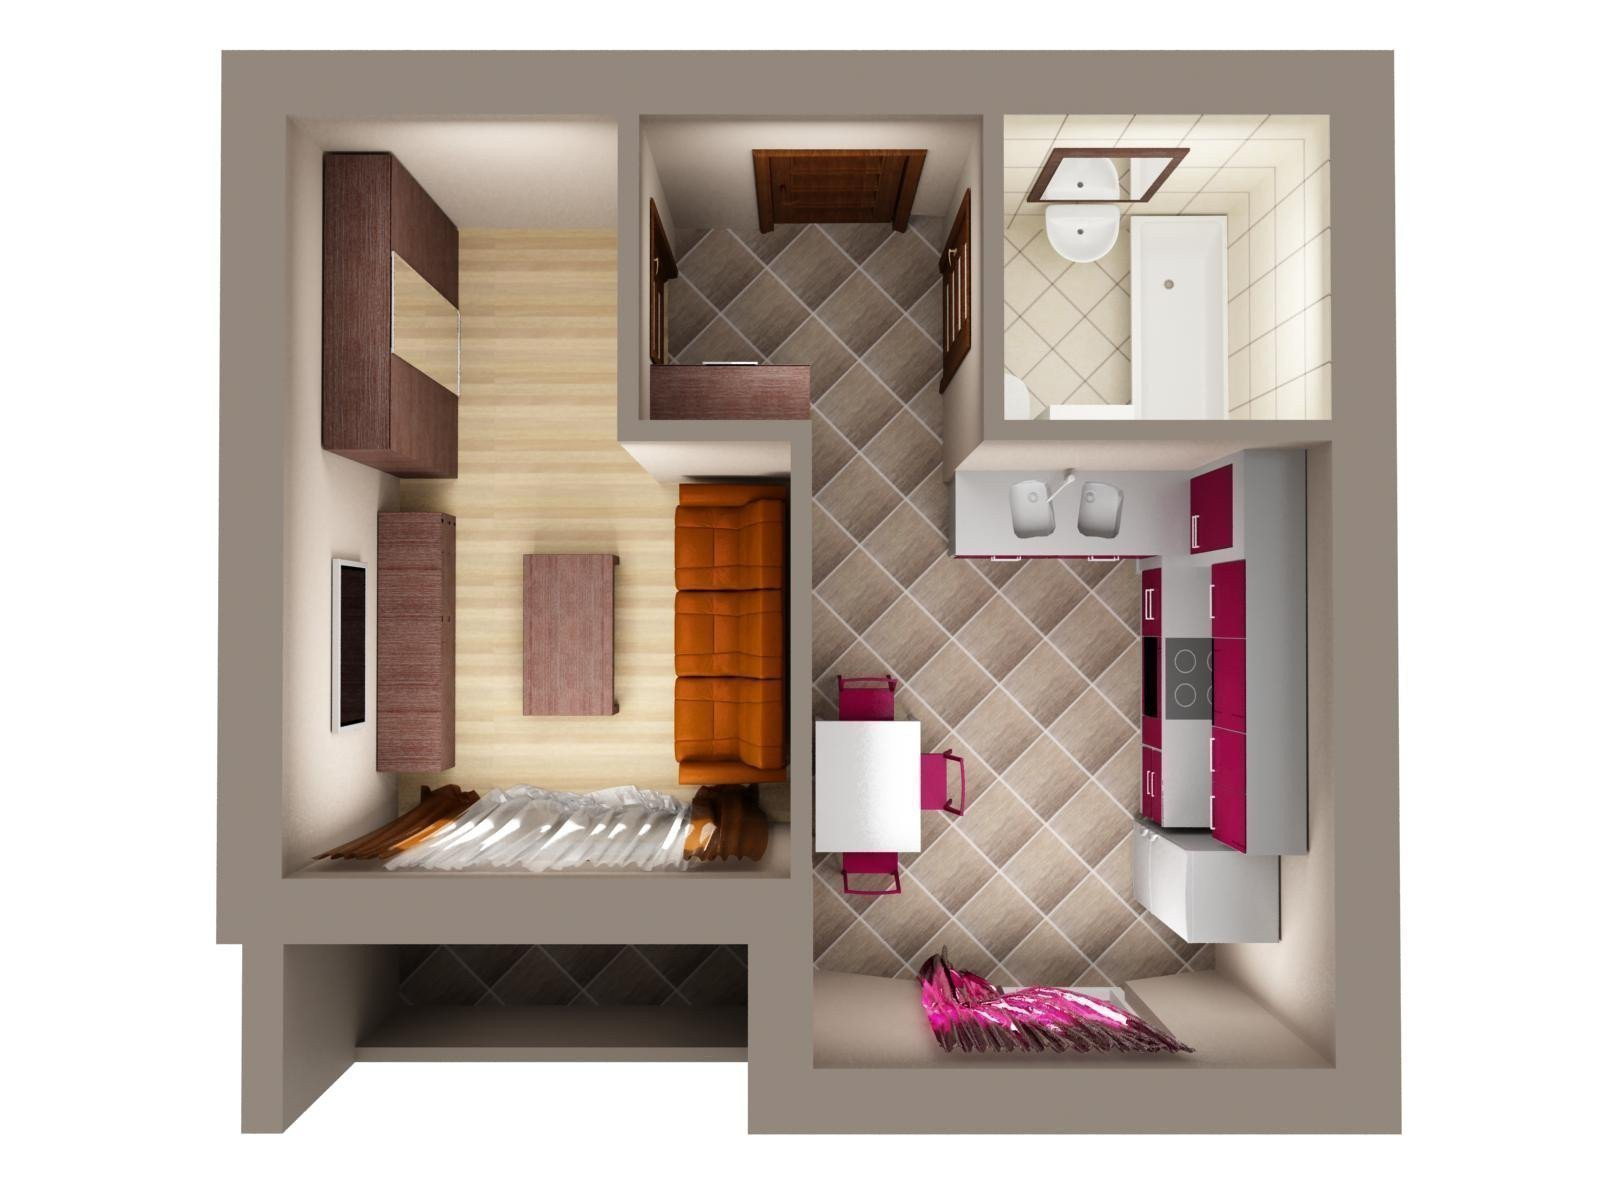 Photo: Sale flat in Ирпень. Announcement № 3385